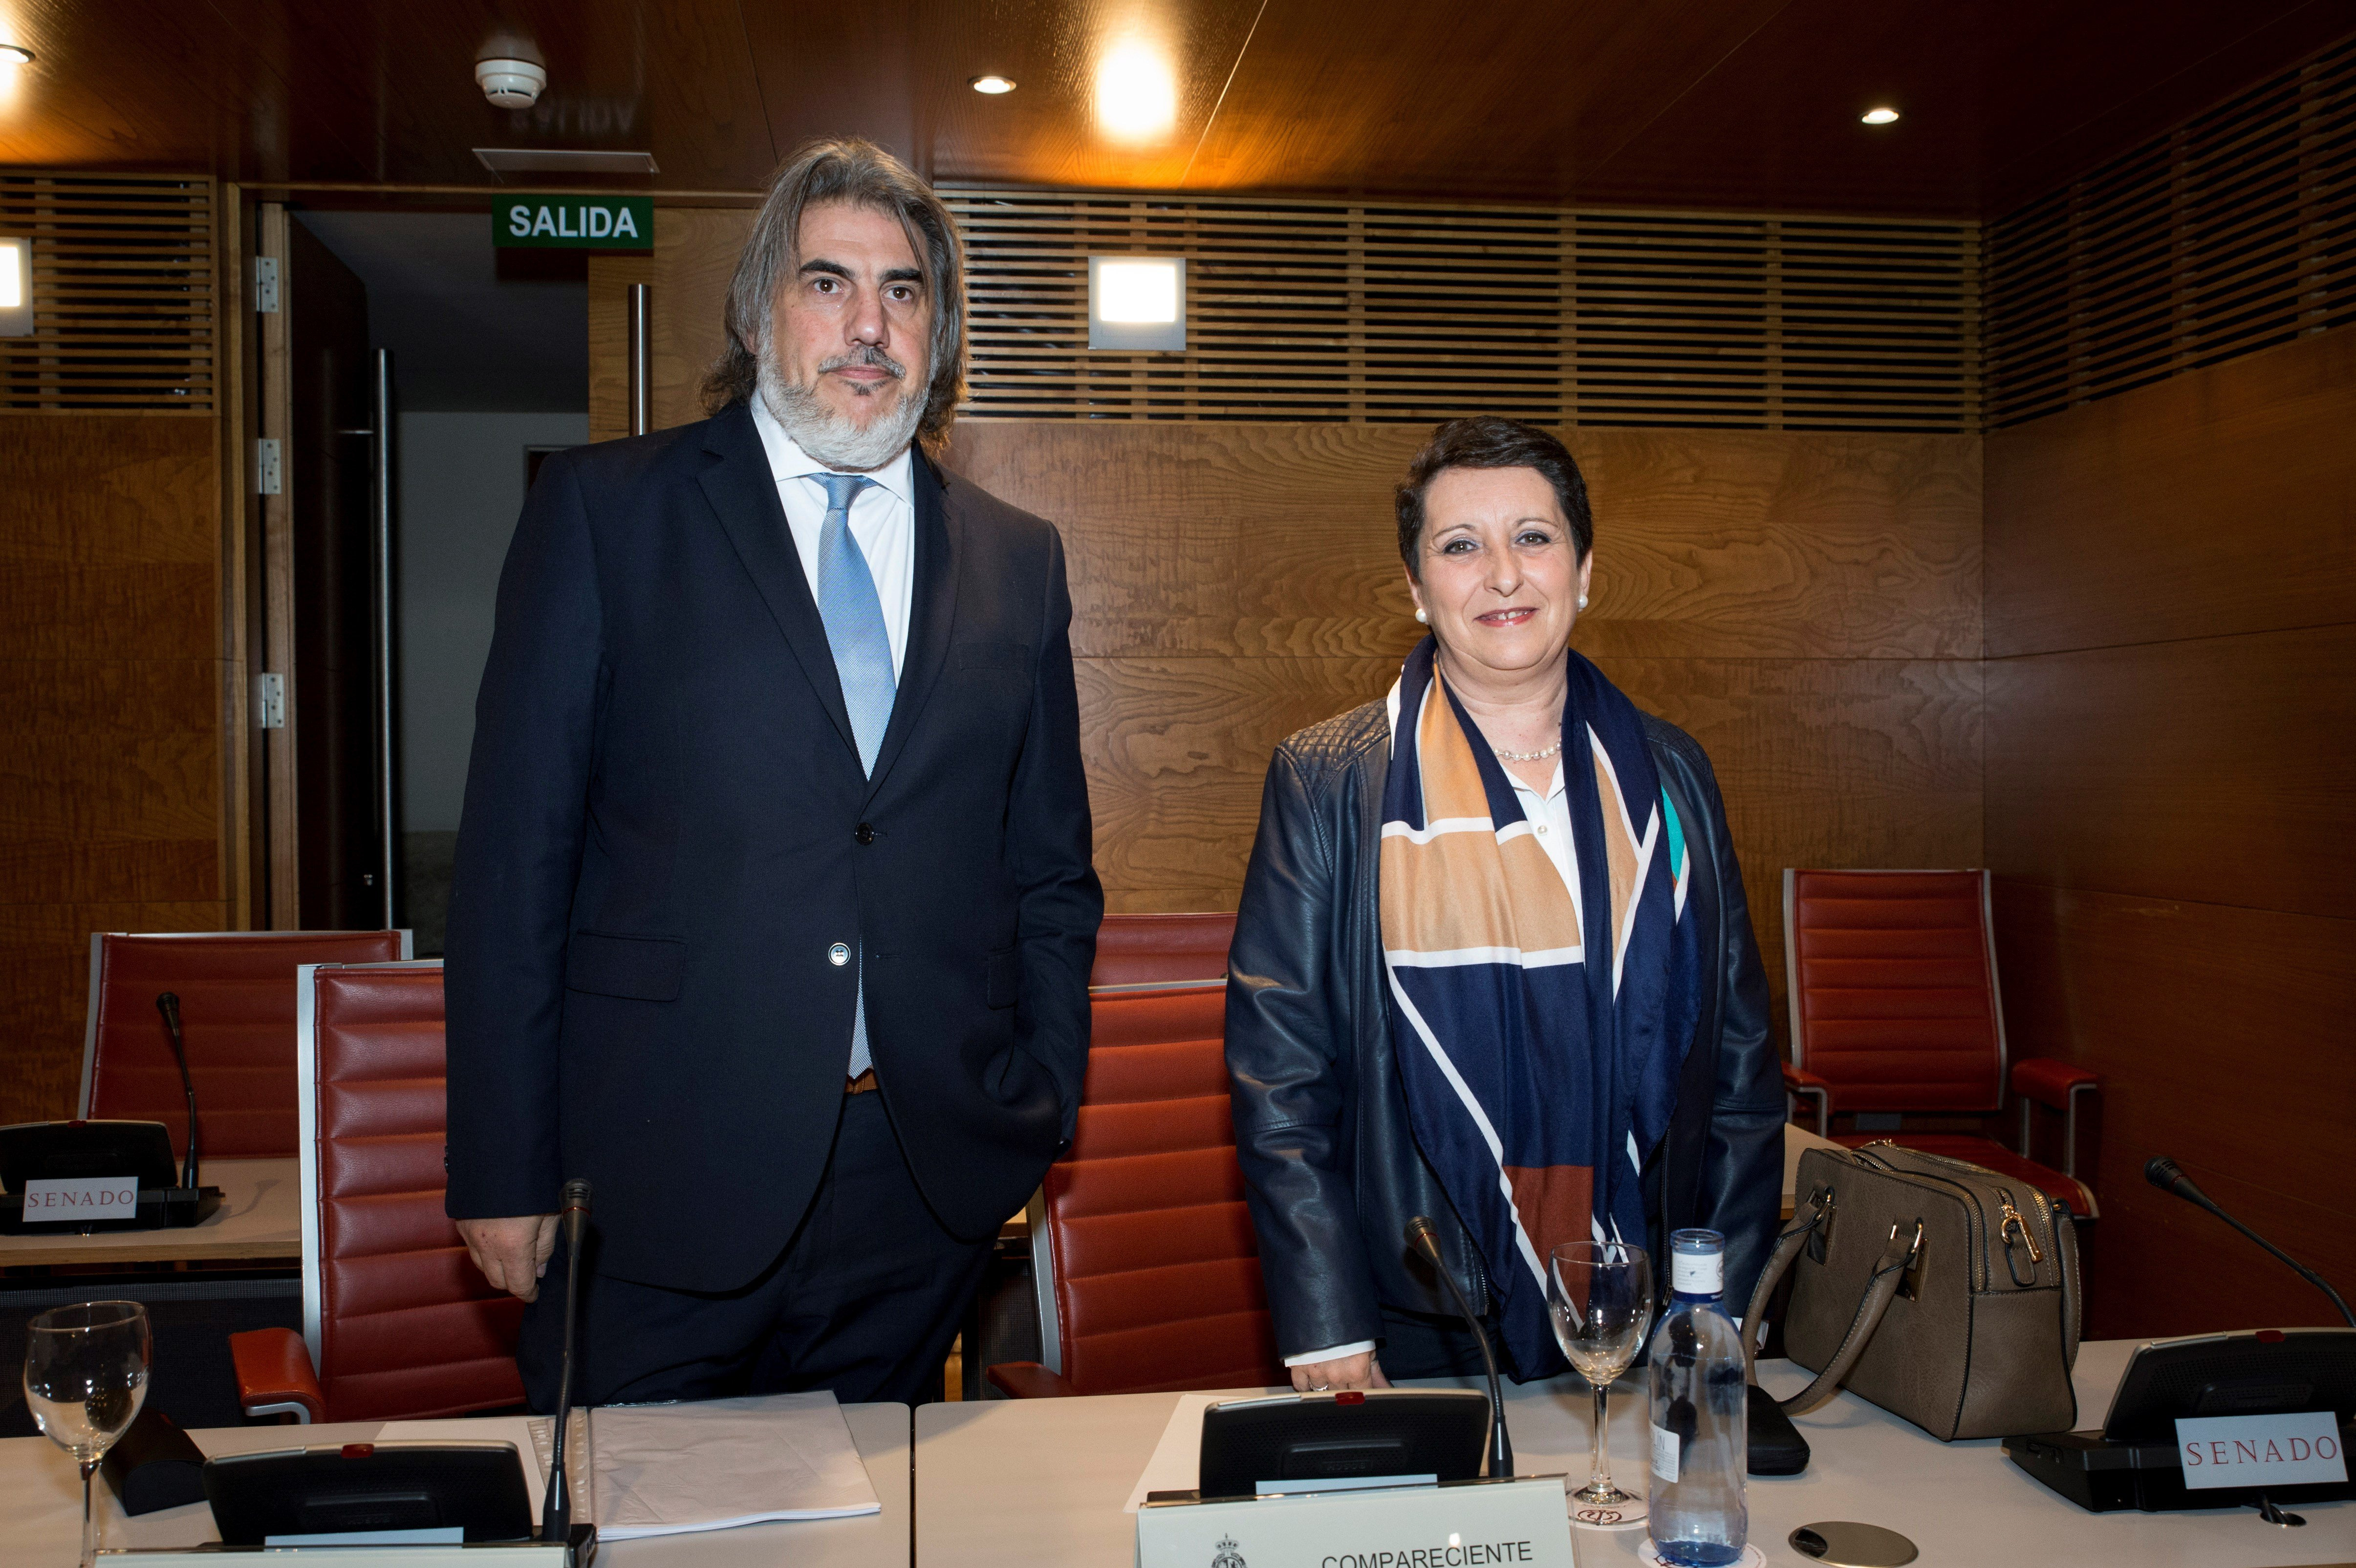 Cs crítics Ganga Sanchez Ruiz finançament irregular EFE